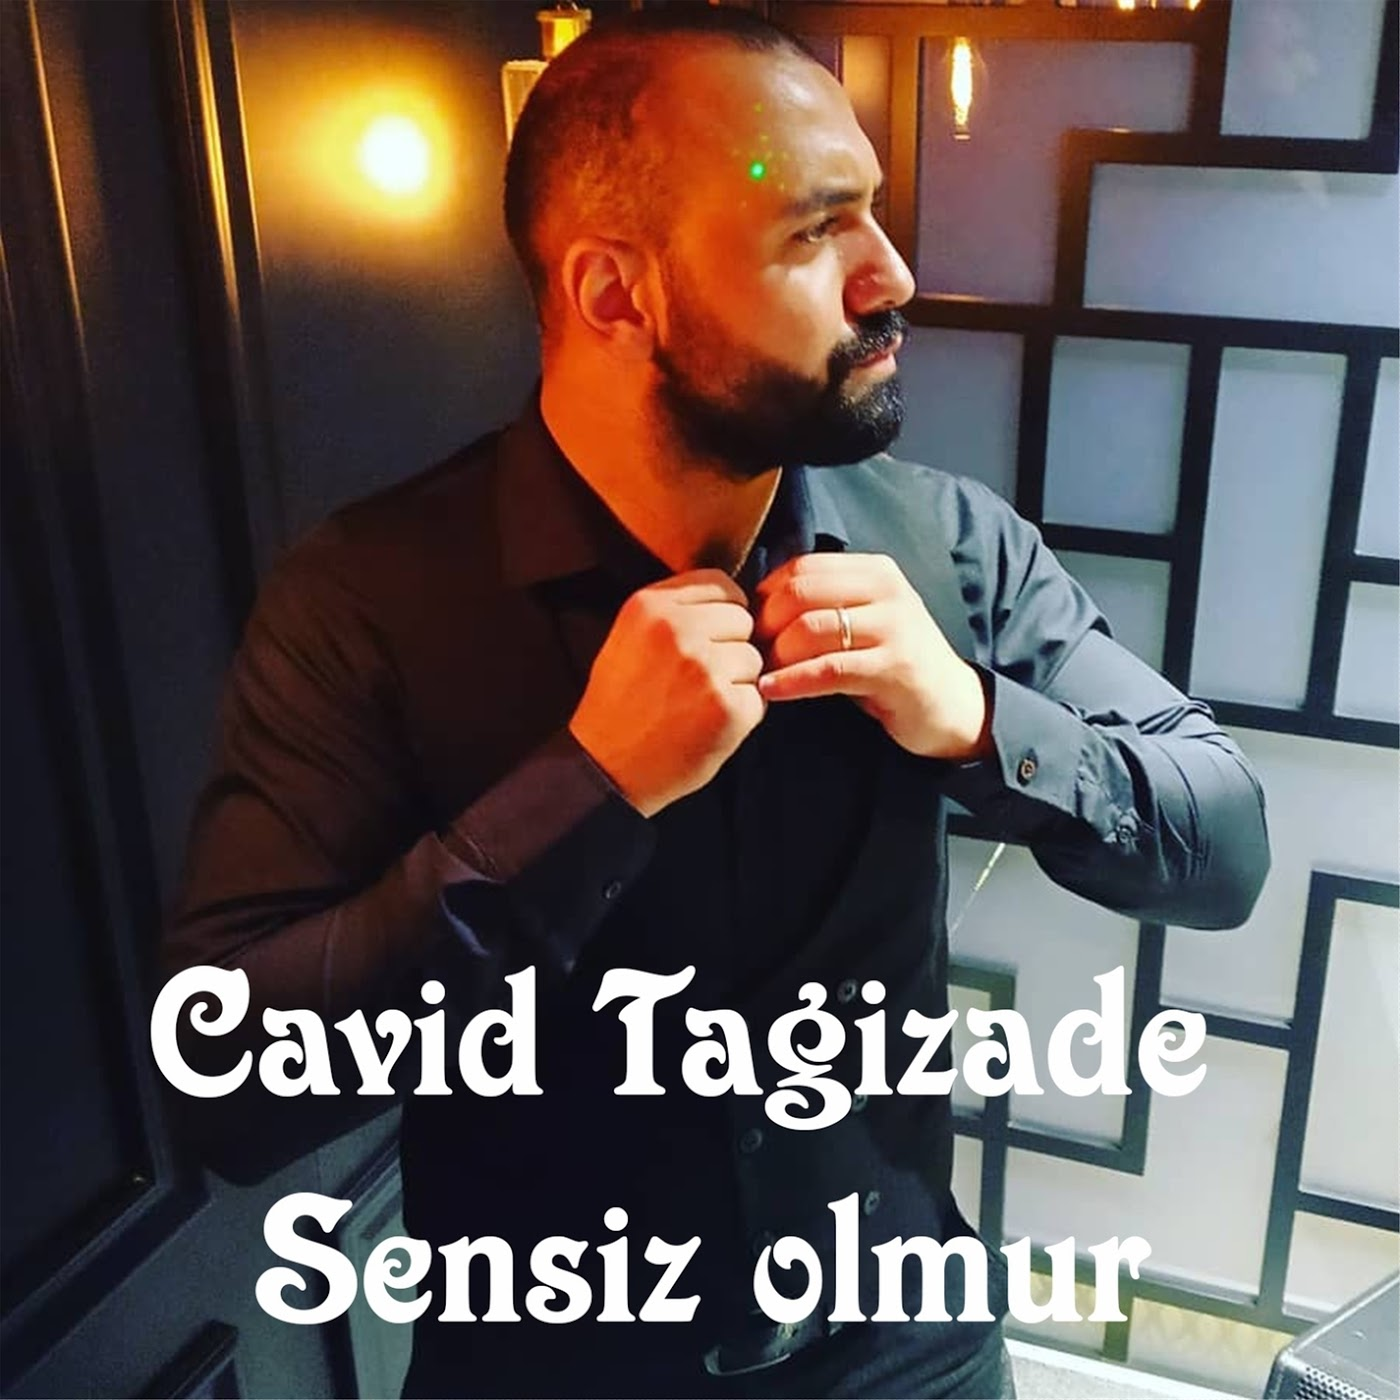 http://s7.picofile.com/file/8391973676/04Cavid_Tagizade_Sensiz_Olmur.jpg